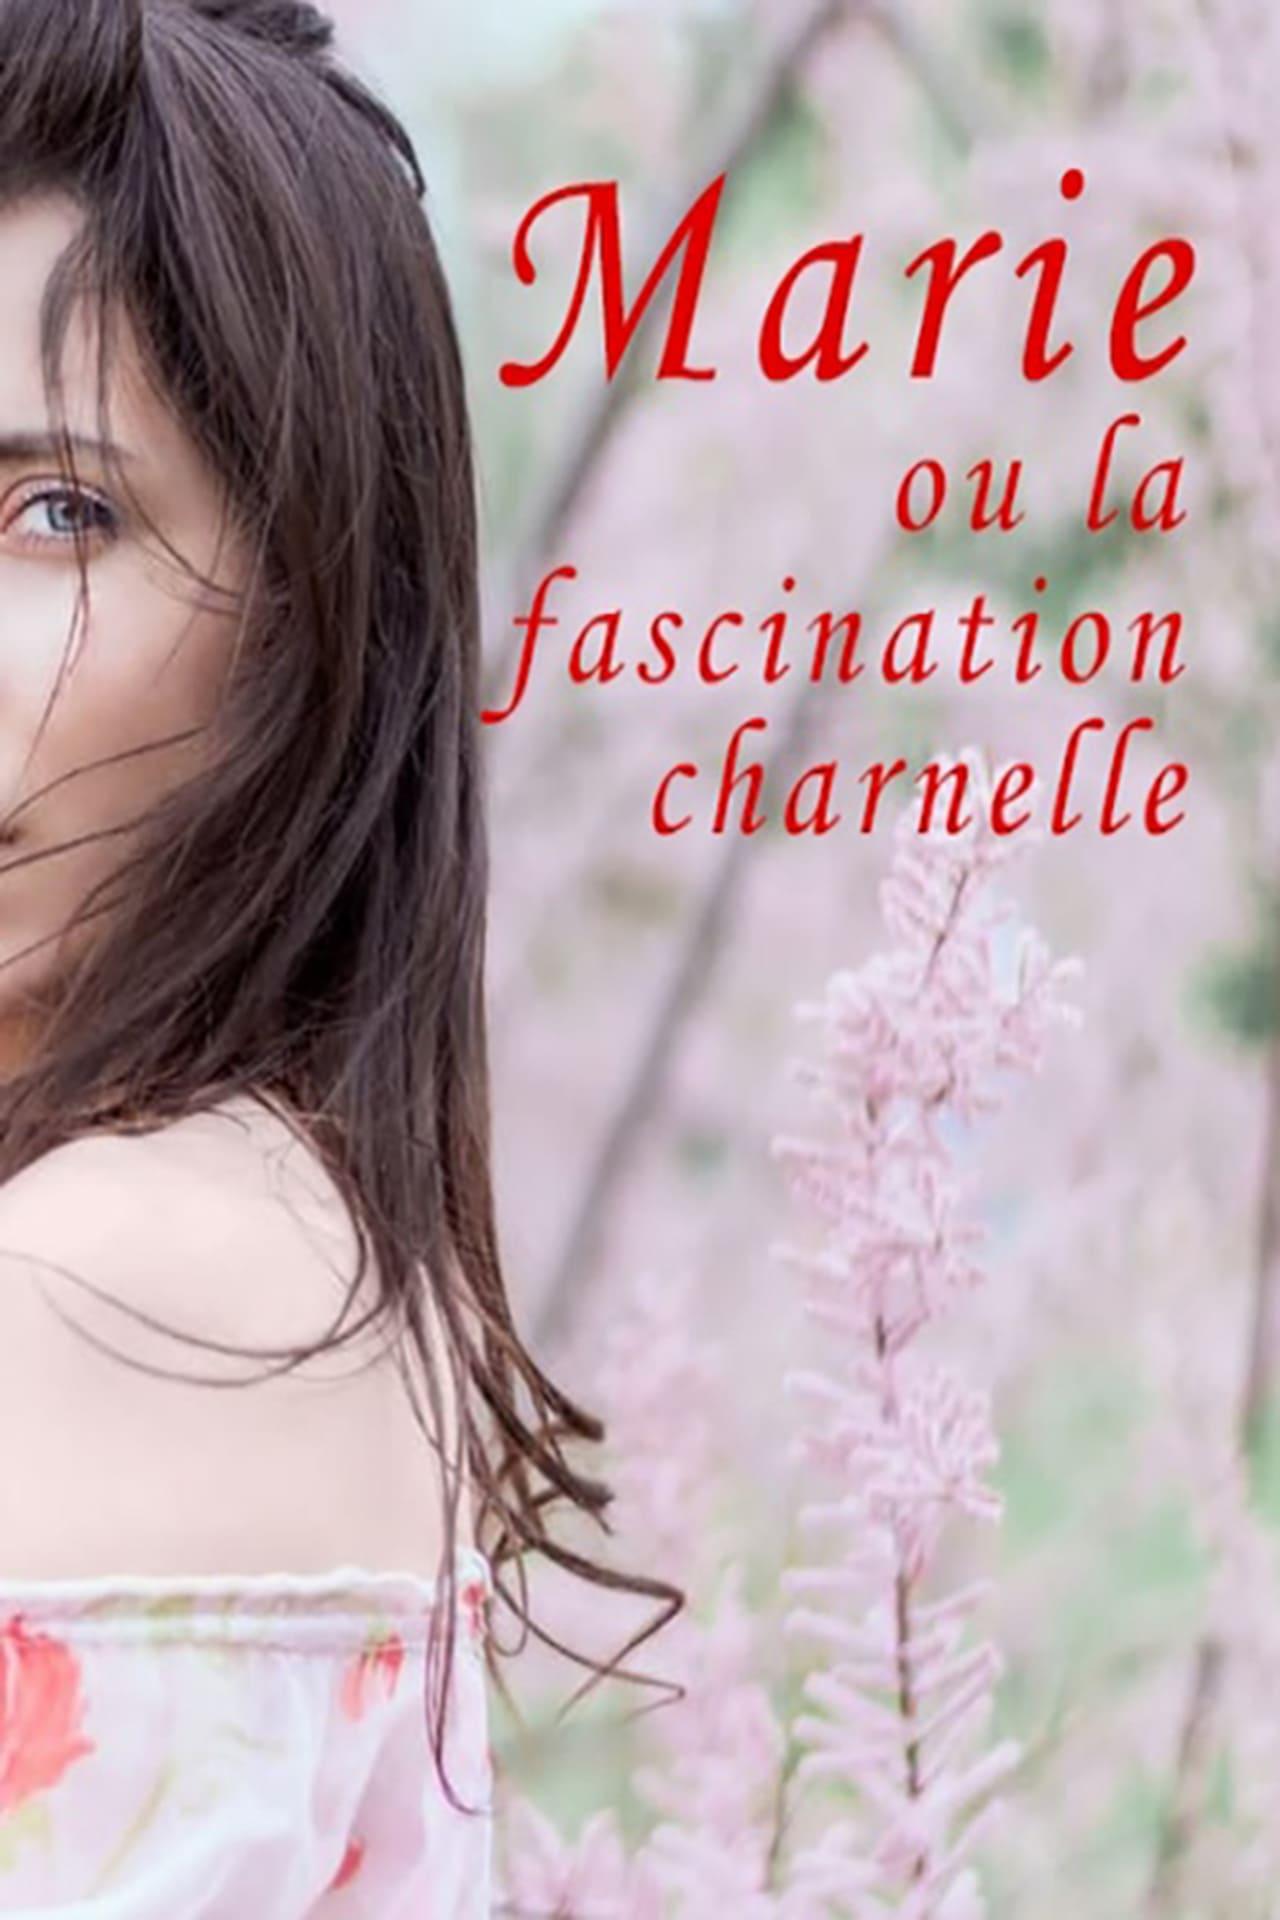 Marie ou la fascination charnelle